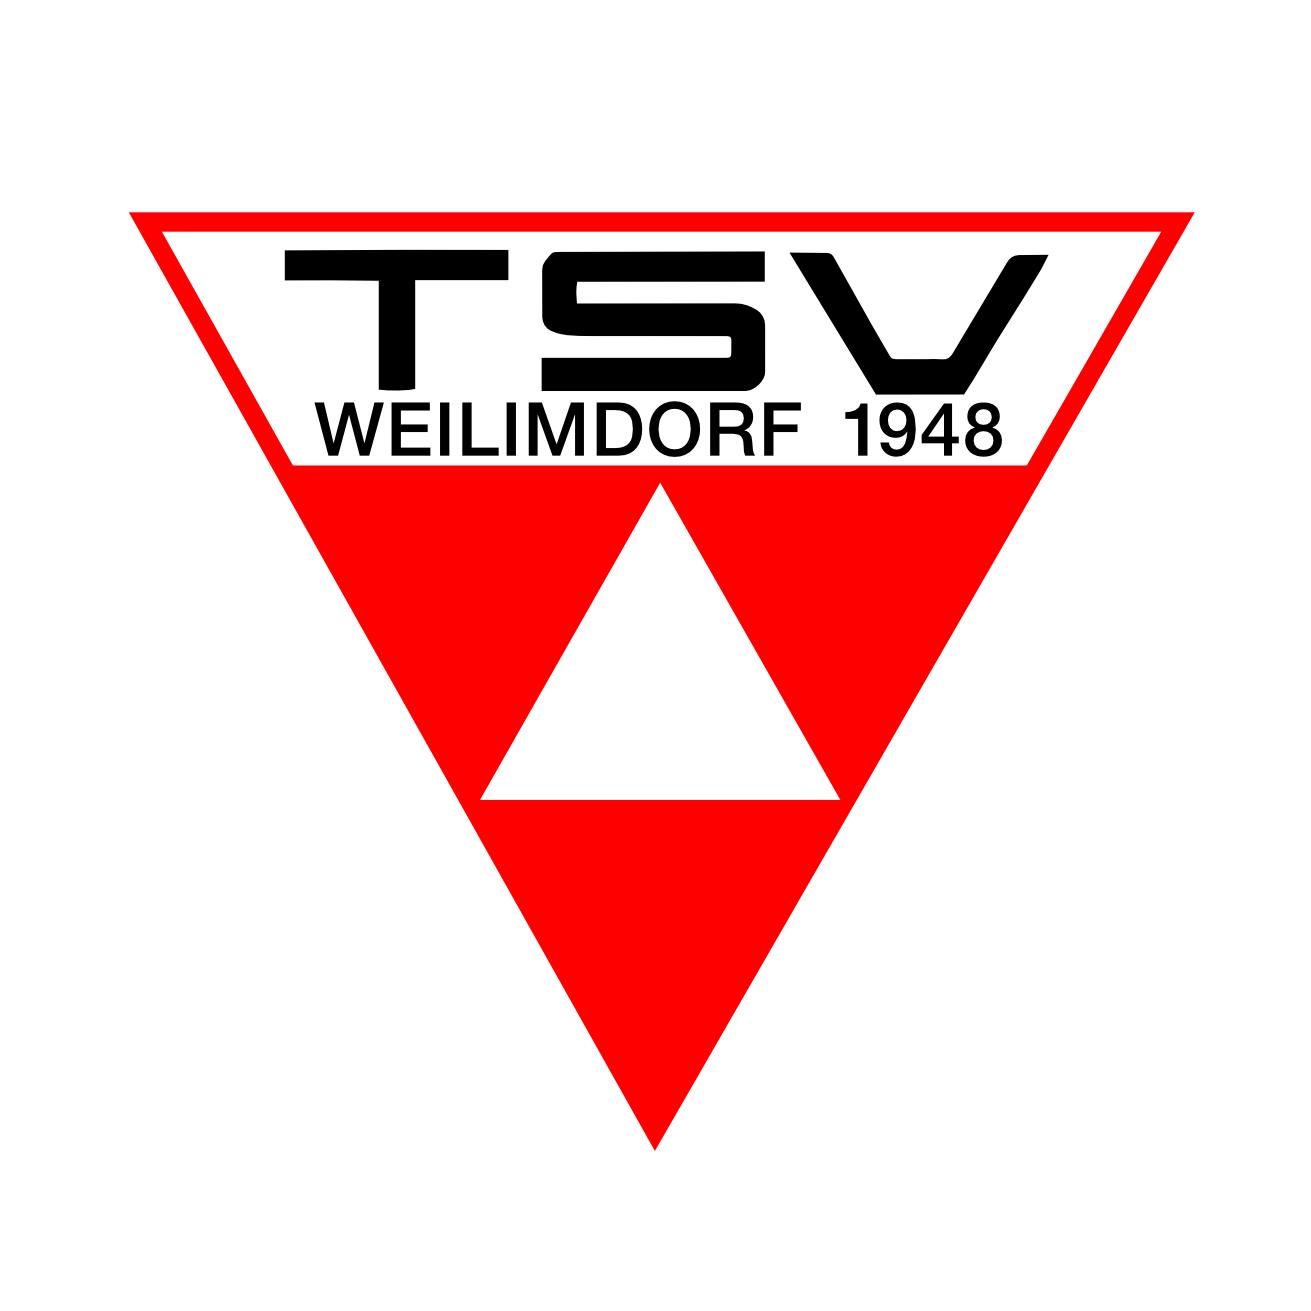 Logo TSV Weilimdorf 1948 e. V.